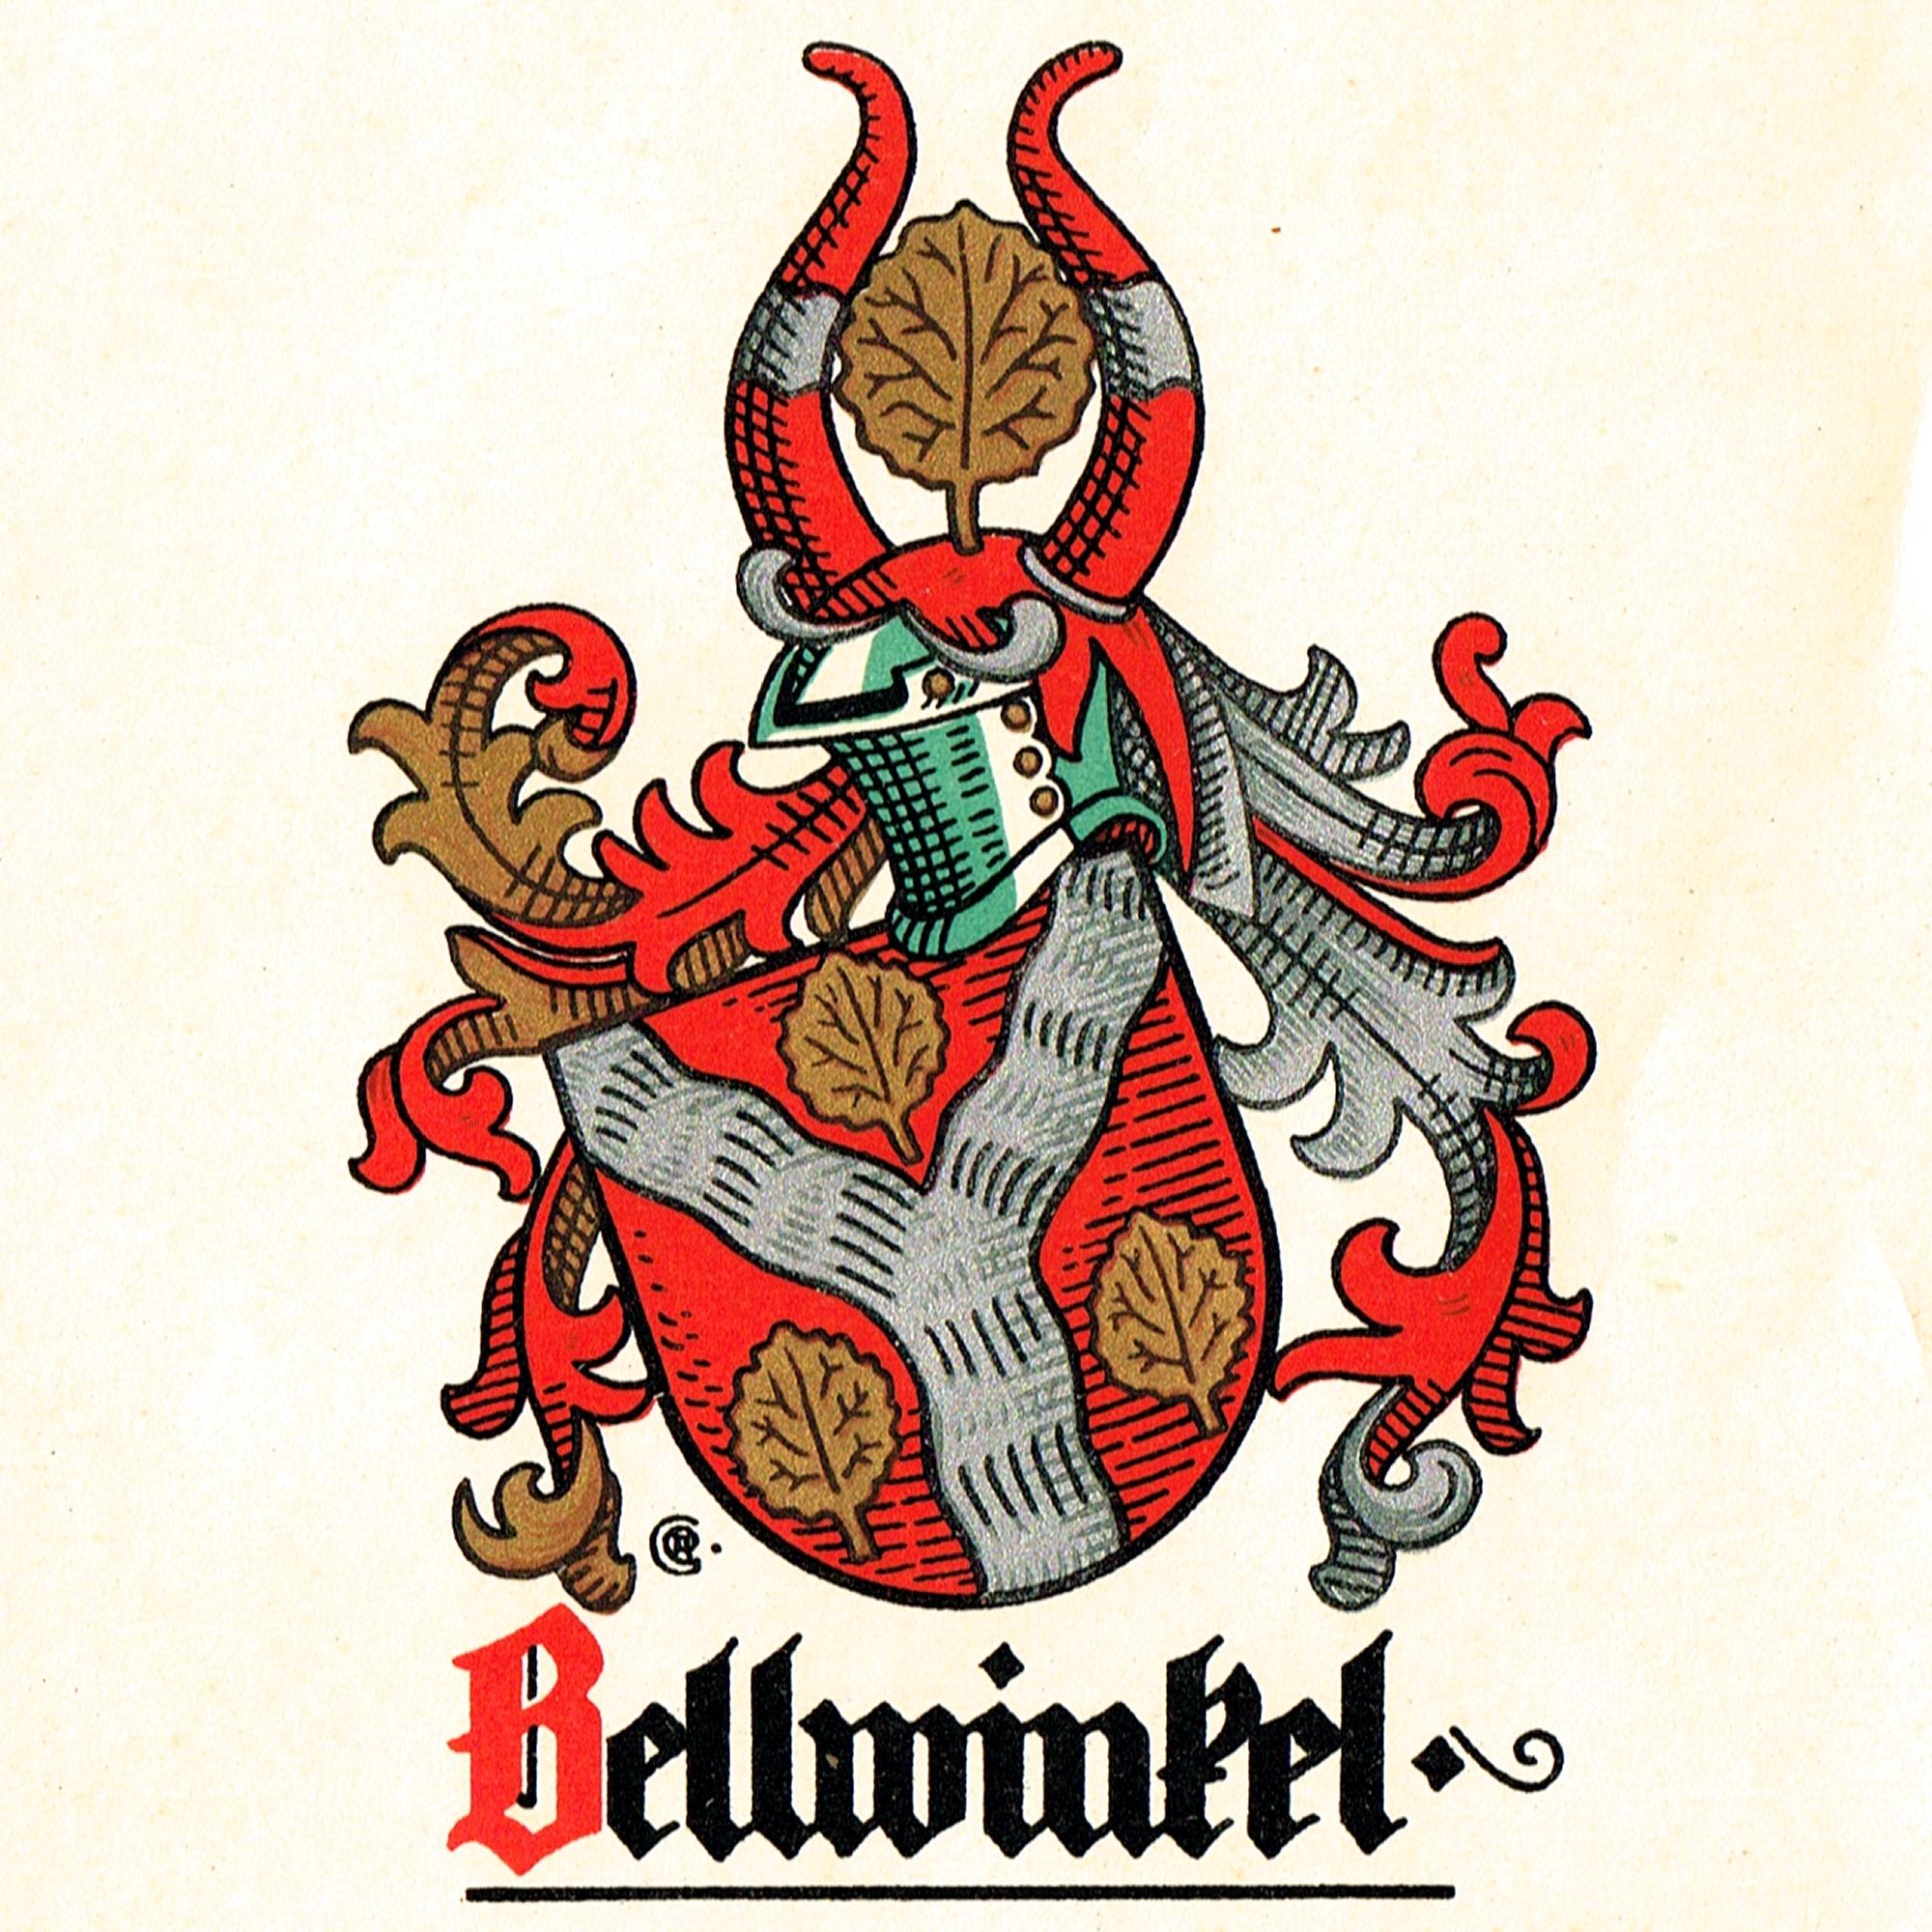 Wappen Bellwinkel - Wappen, Heraldik, Gustav Adolf Cloß, Ernst Bellwinkel, Deutsche Roland-Wappenrolle, Der Deutsche Roland, Bellwinkel, 1936